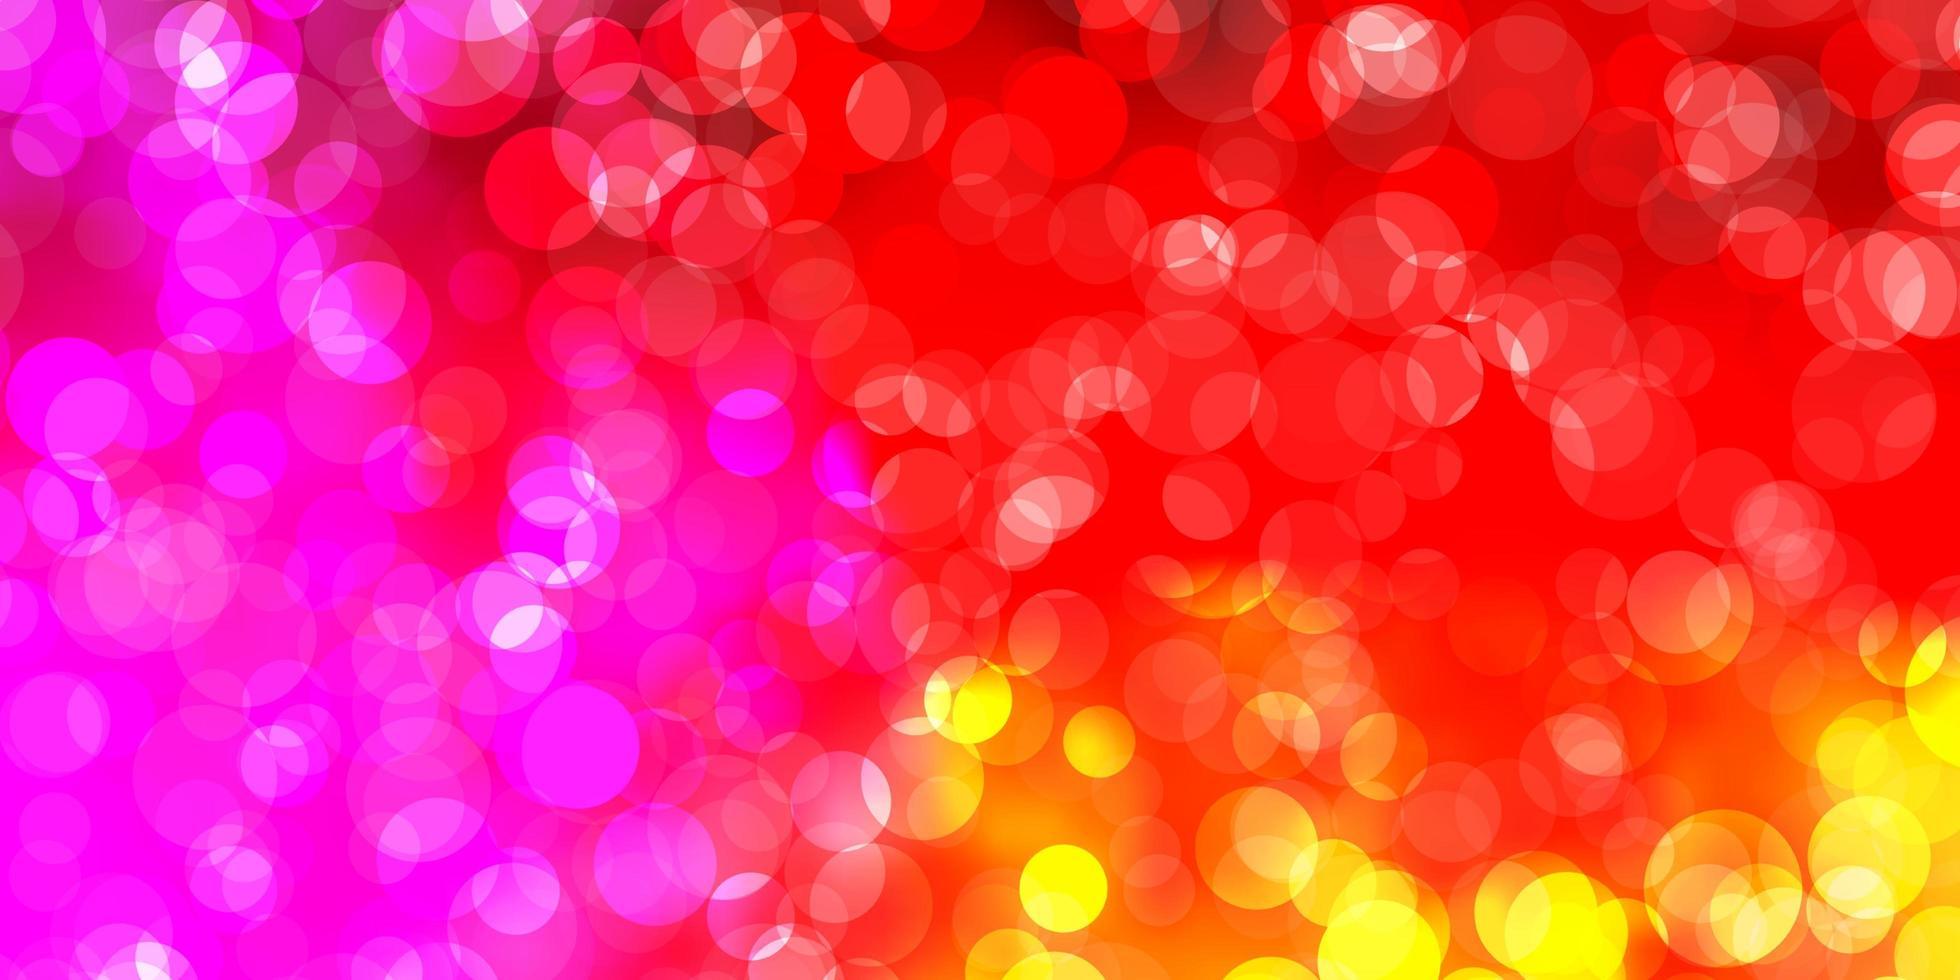 fundo vector rosa claro, amarelo com manchas.